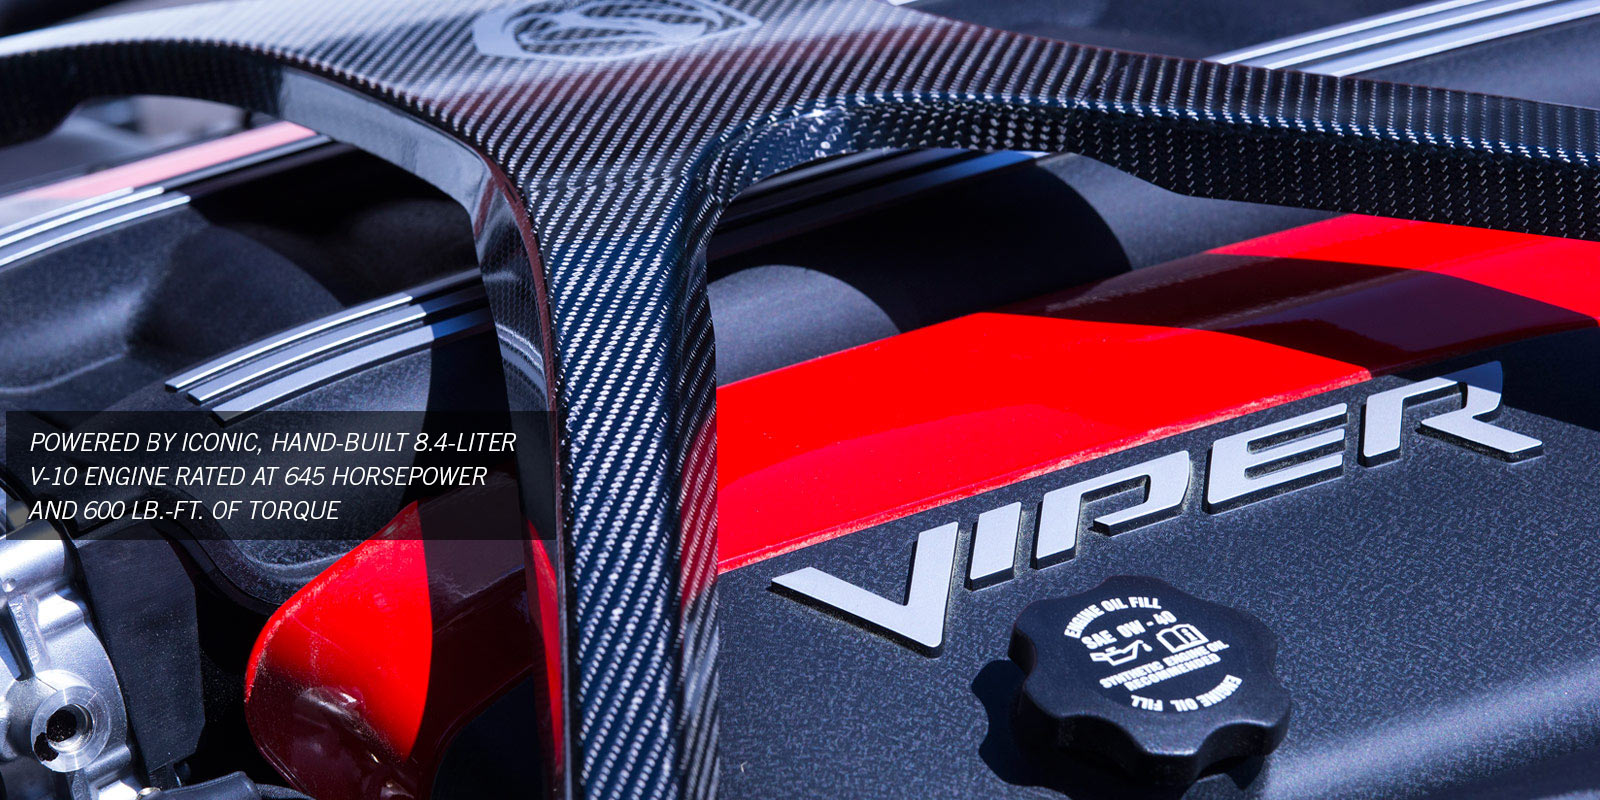 2016 Dodge Viper ACR - V10